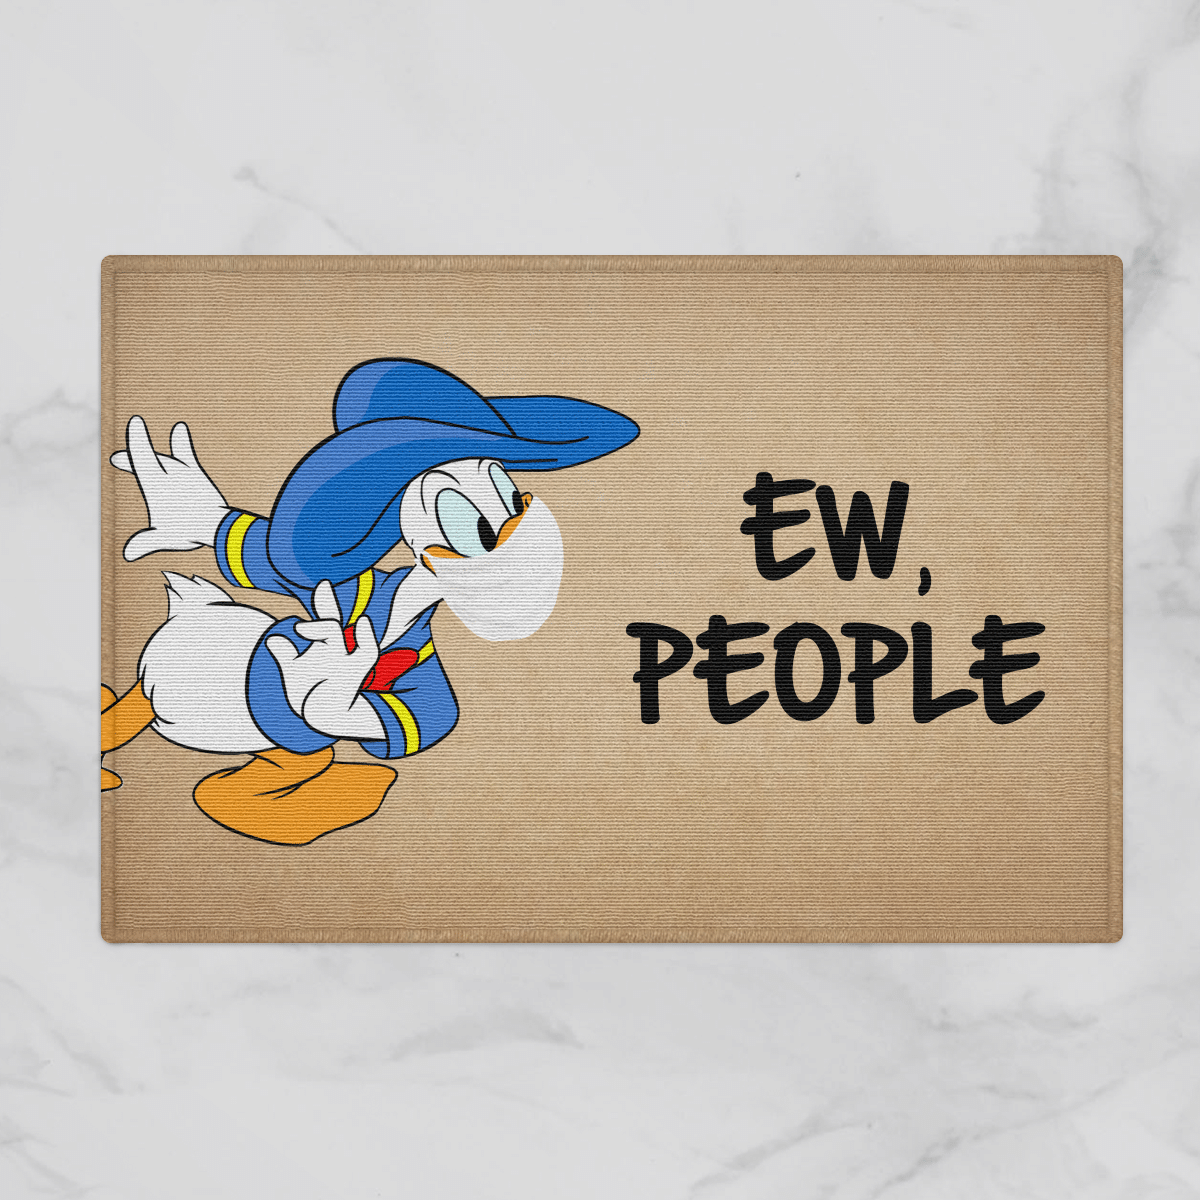 Donald Disney Ew People Door Mat Bath Mat